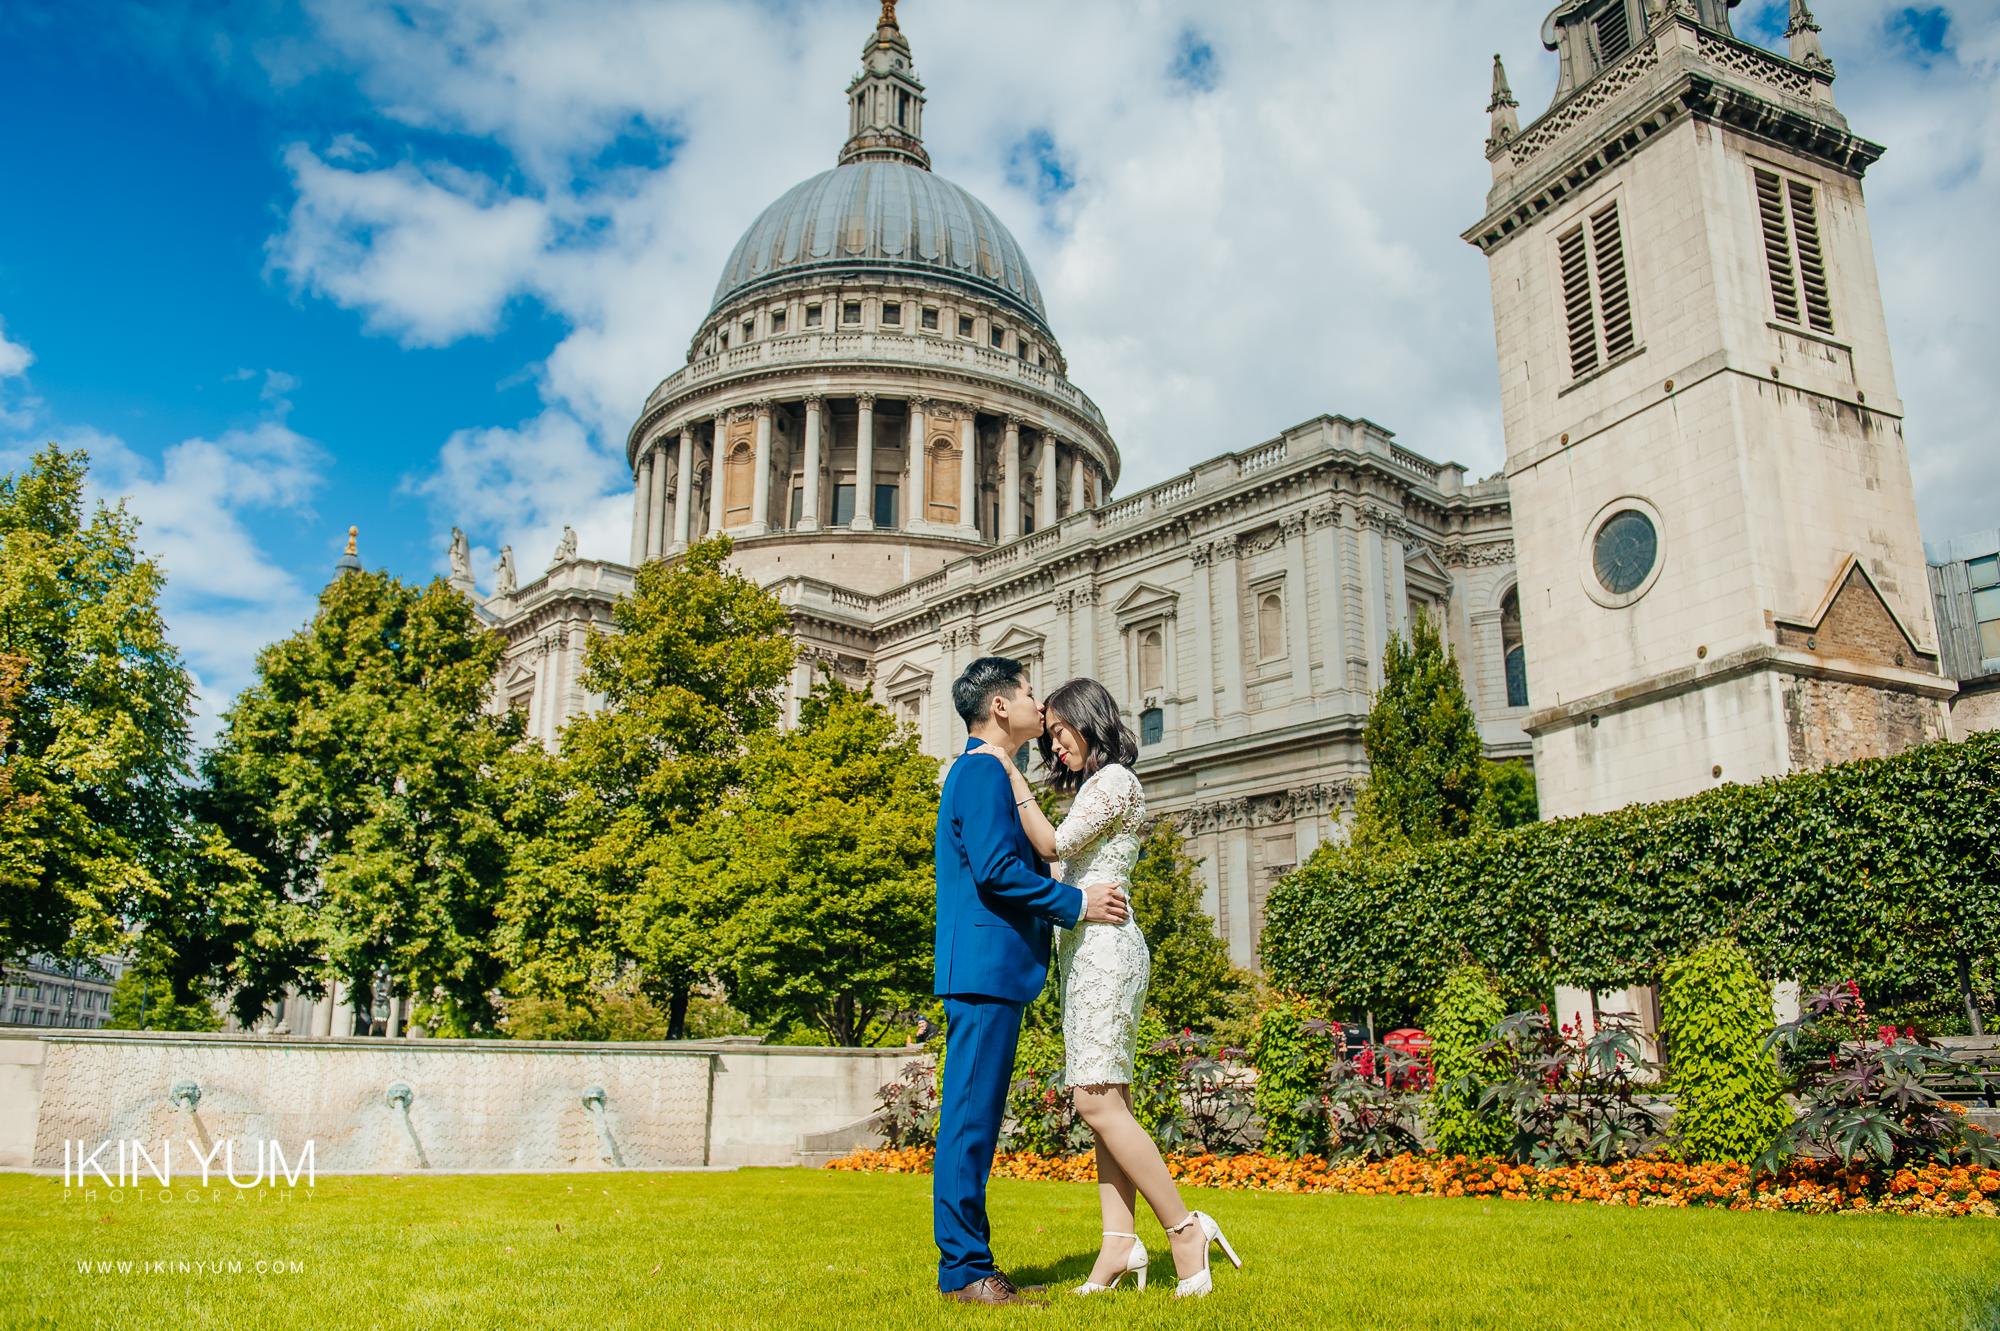 Natalie & Duncan Wedding Day - Ikin Yum Photography-105.jpg